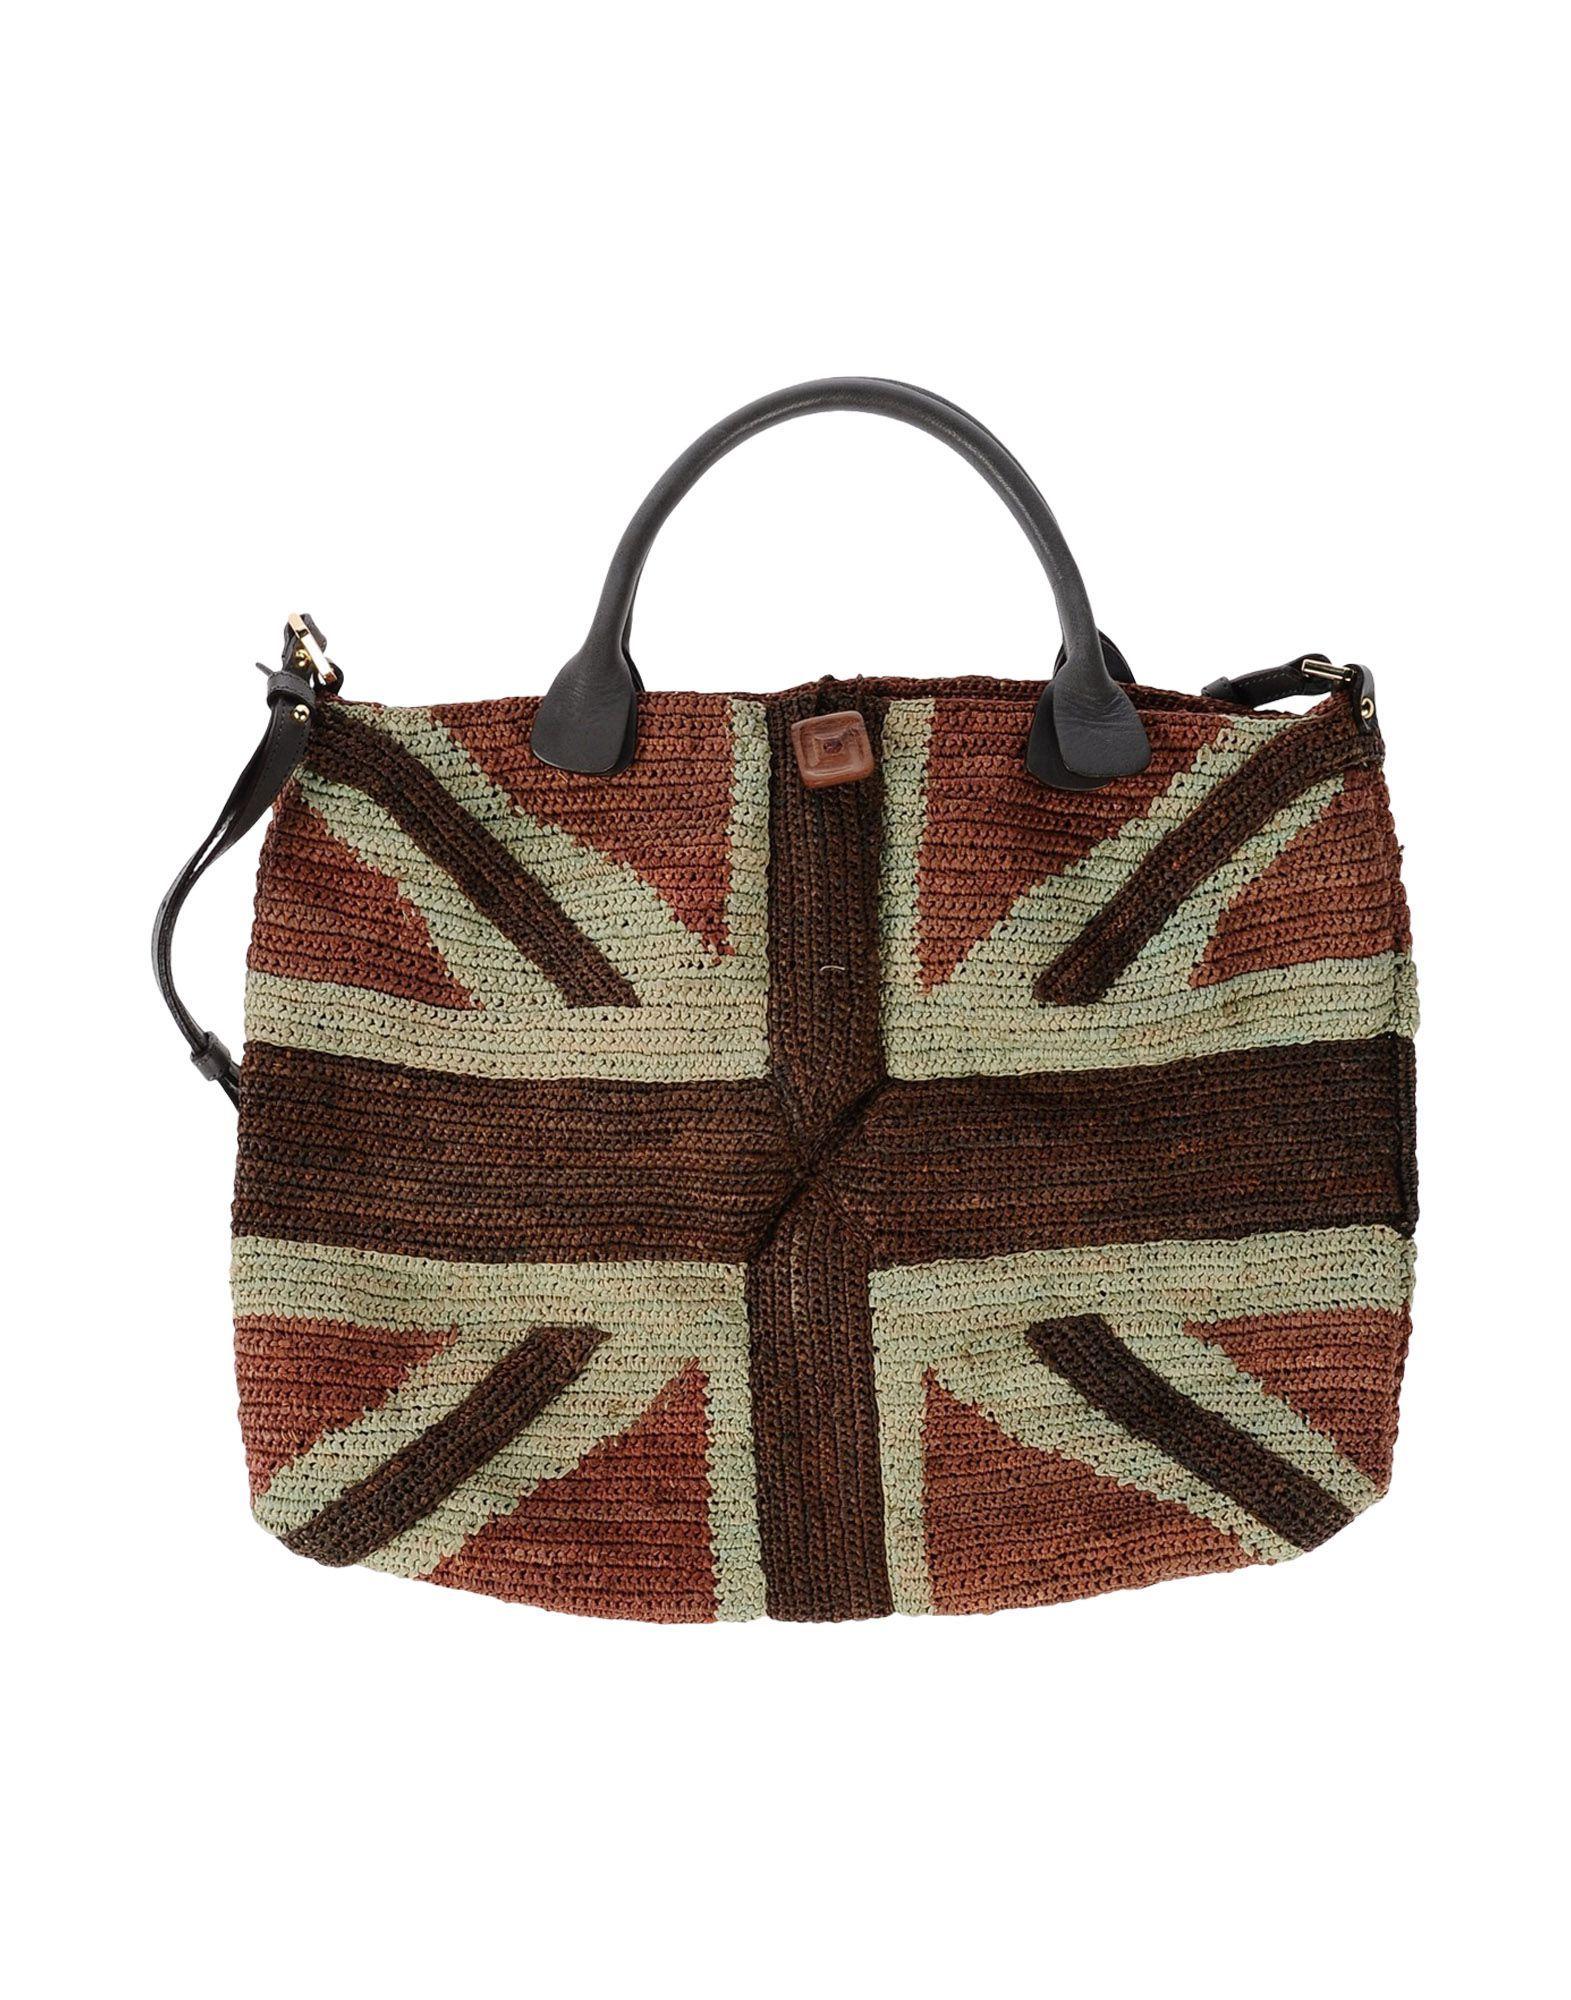 Jamin Puech HANDBAGS - Handbags su YOOX.COM rLzcQI